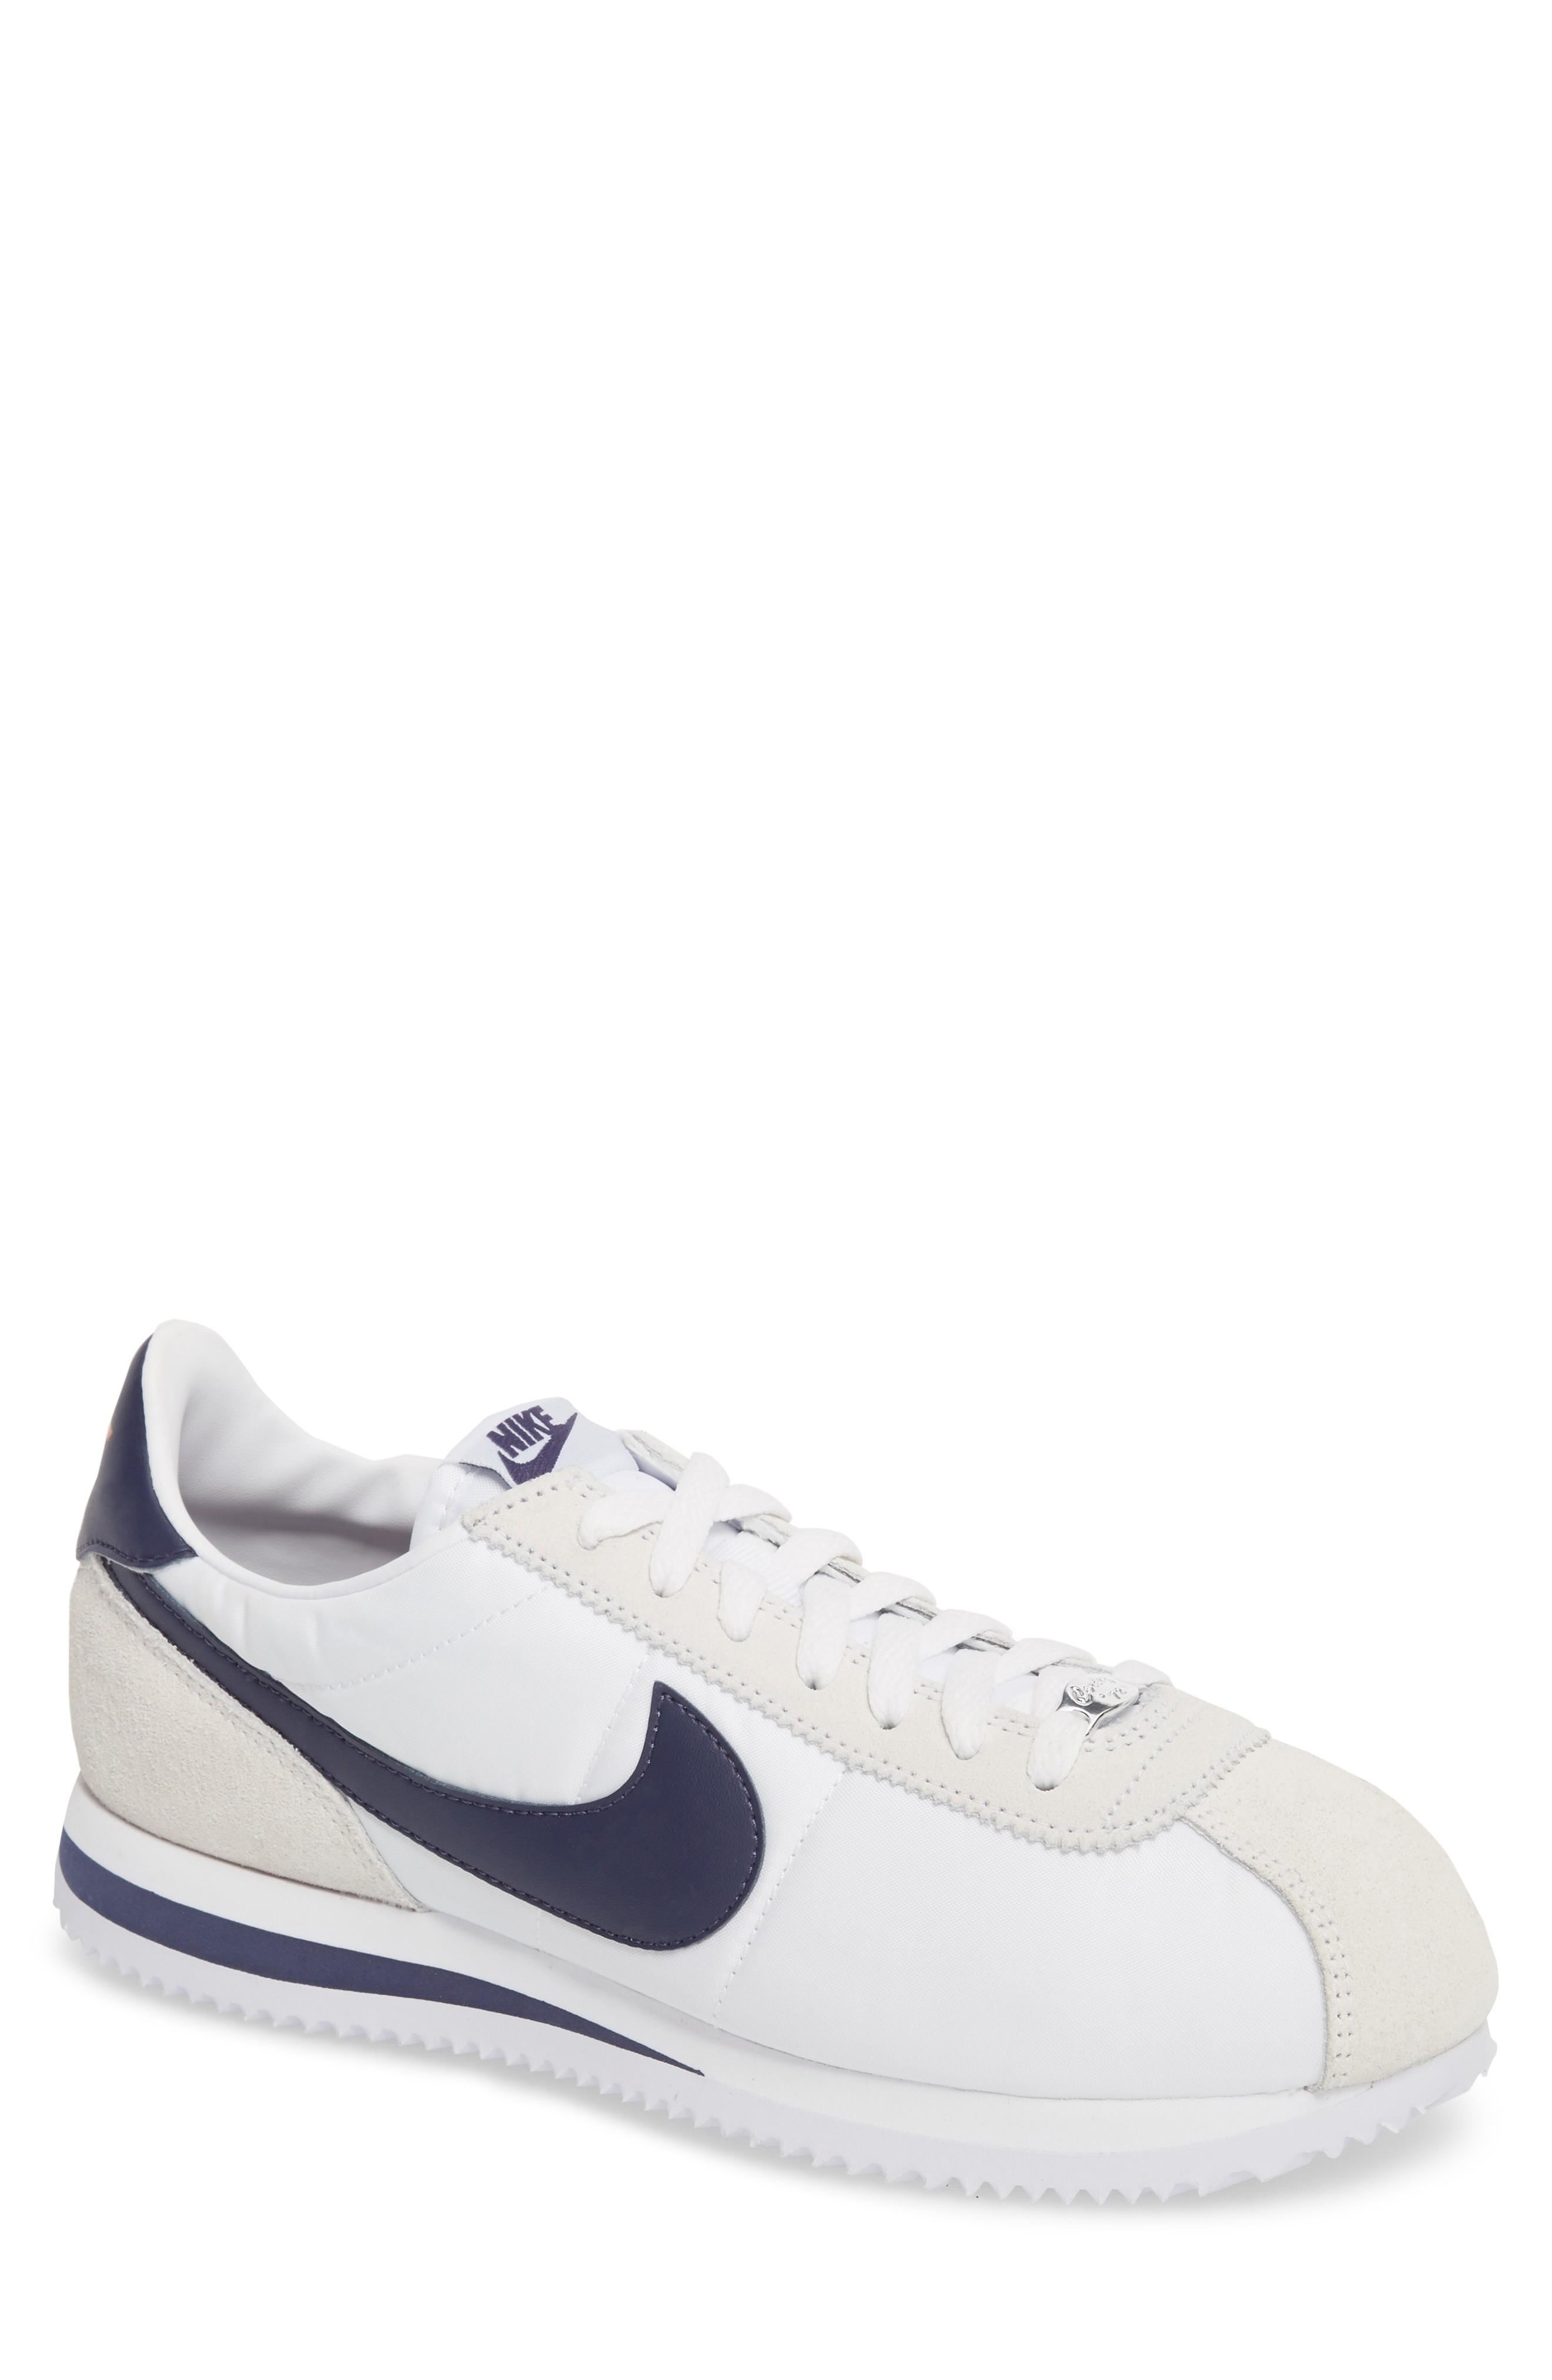 b5b5118b Nike Cortez Basic Nylon Sneaker In White/ Indigo/ Habanero Red ...